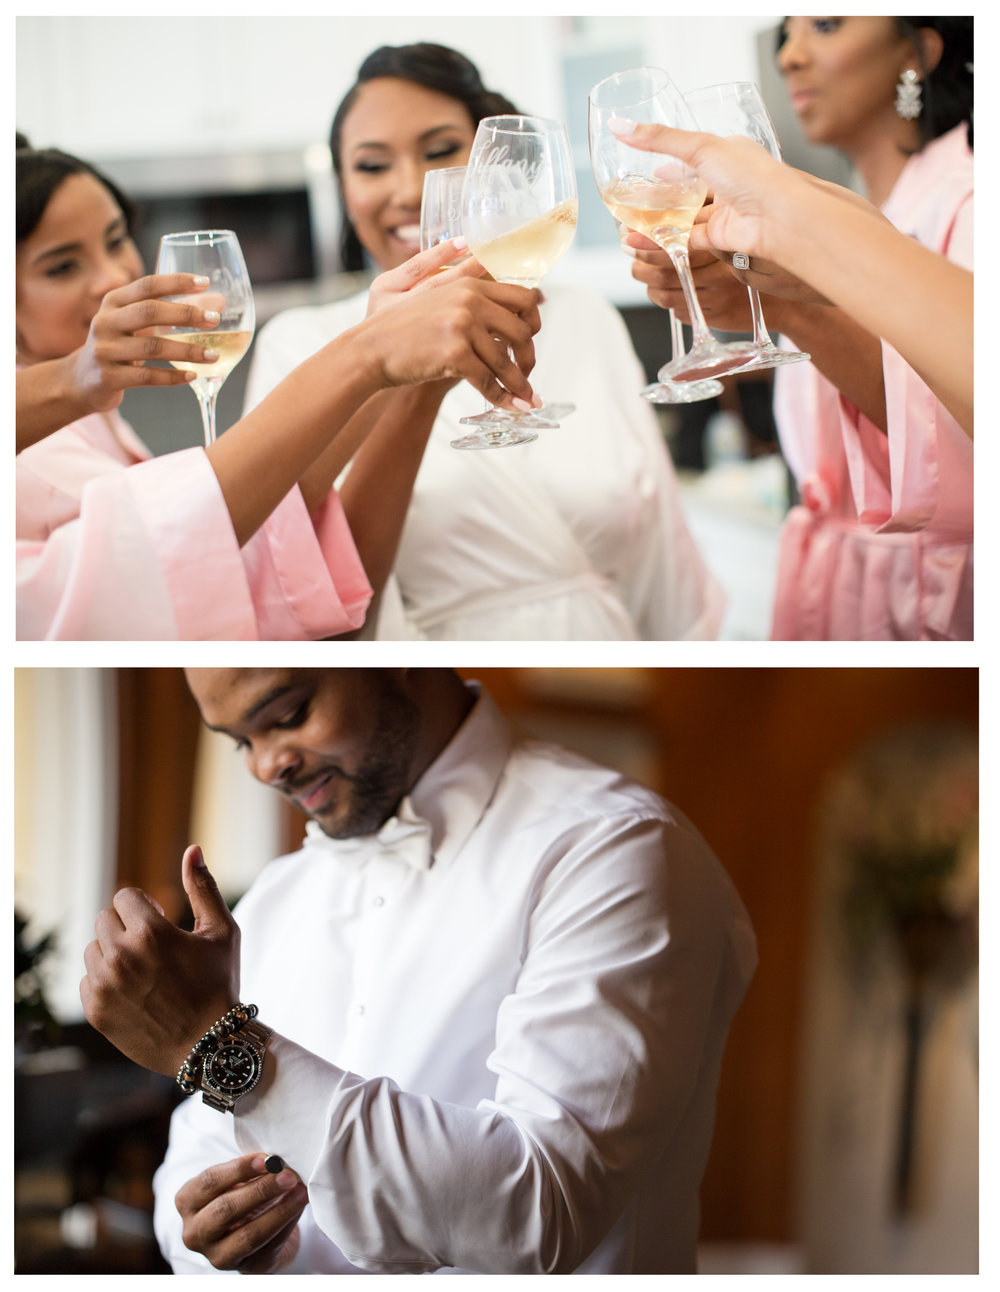 Benvenuto_wedding_Boynton_Beach_Jodi_Fjelde_Photography_Nikki_Otis_married_5.jpg